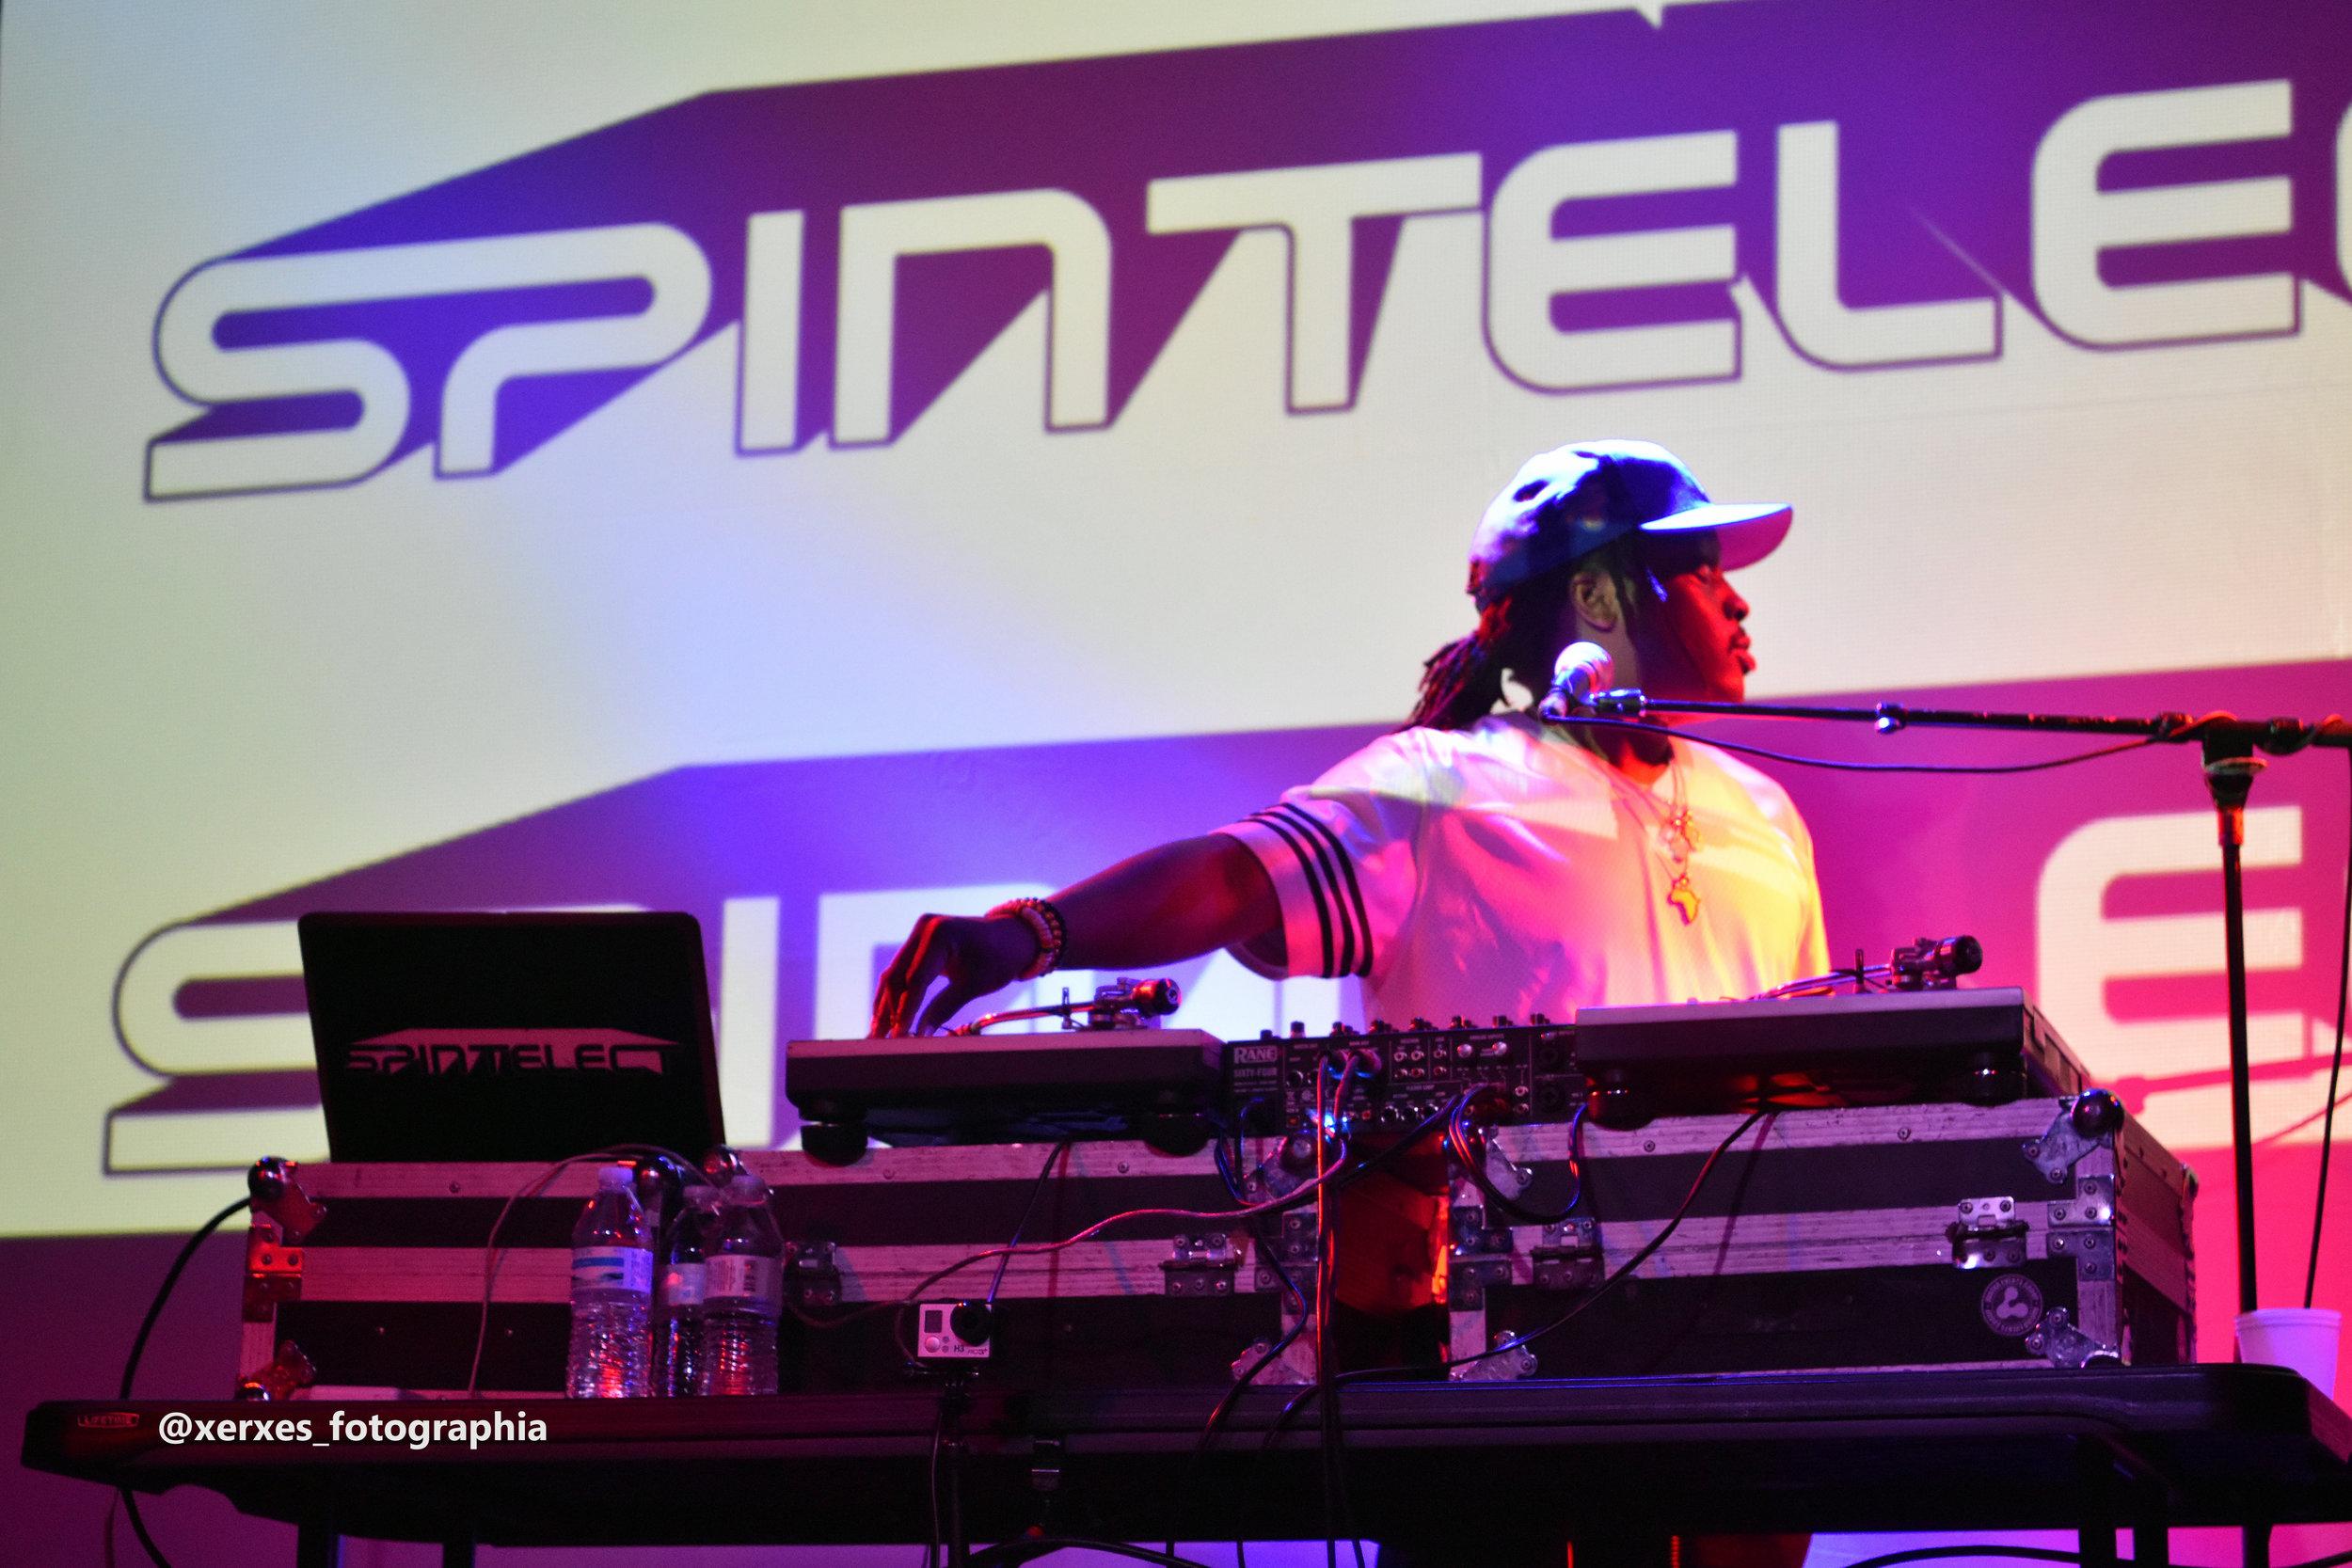 dj-spintelect-15.jpg